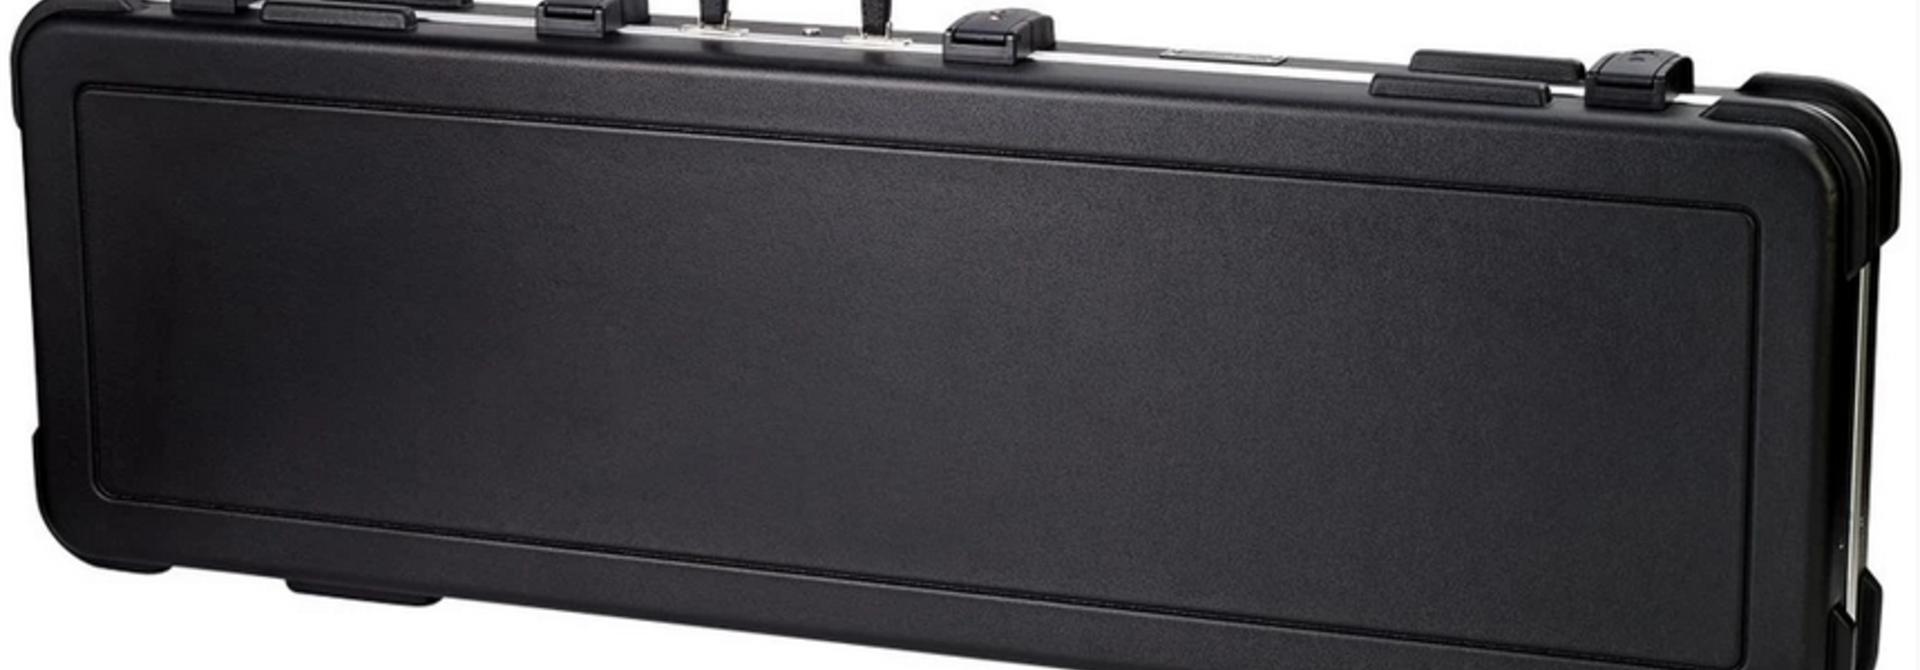 ProRockGear RGM386TSA ABS DLX Rect. Bass Case